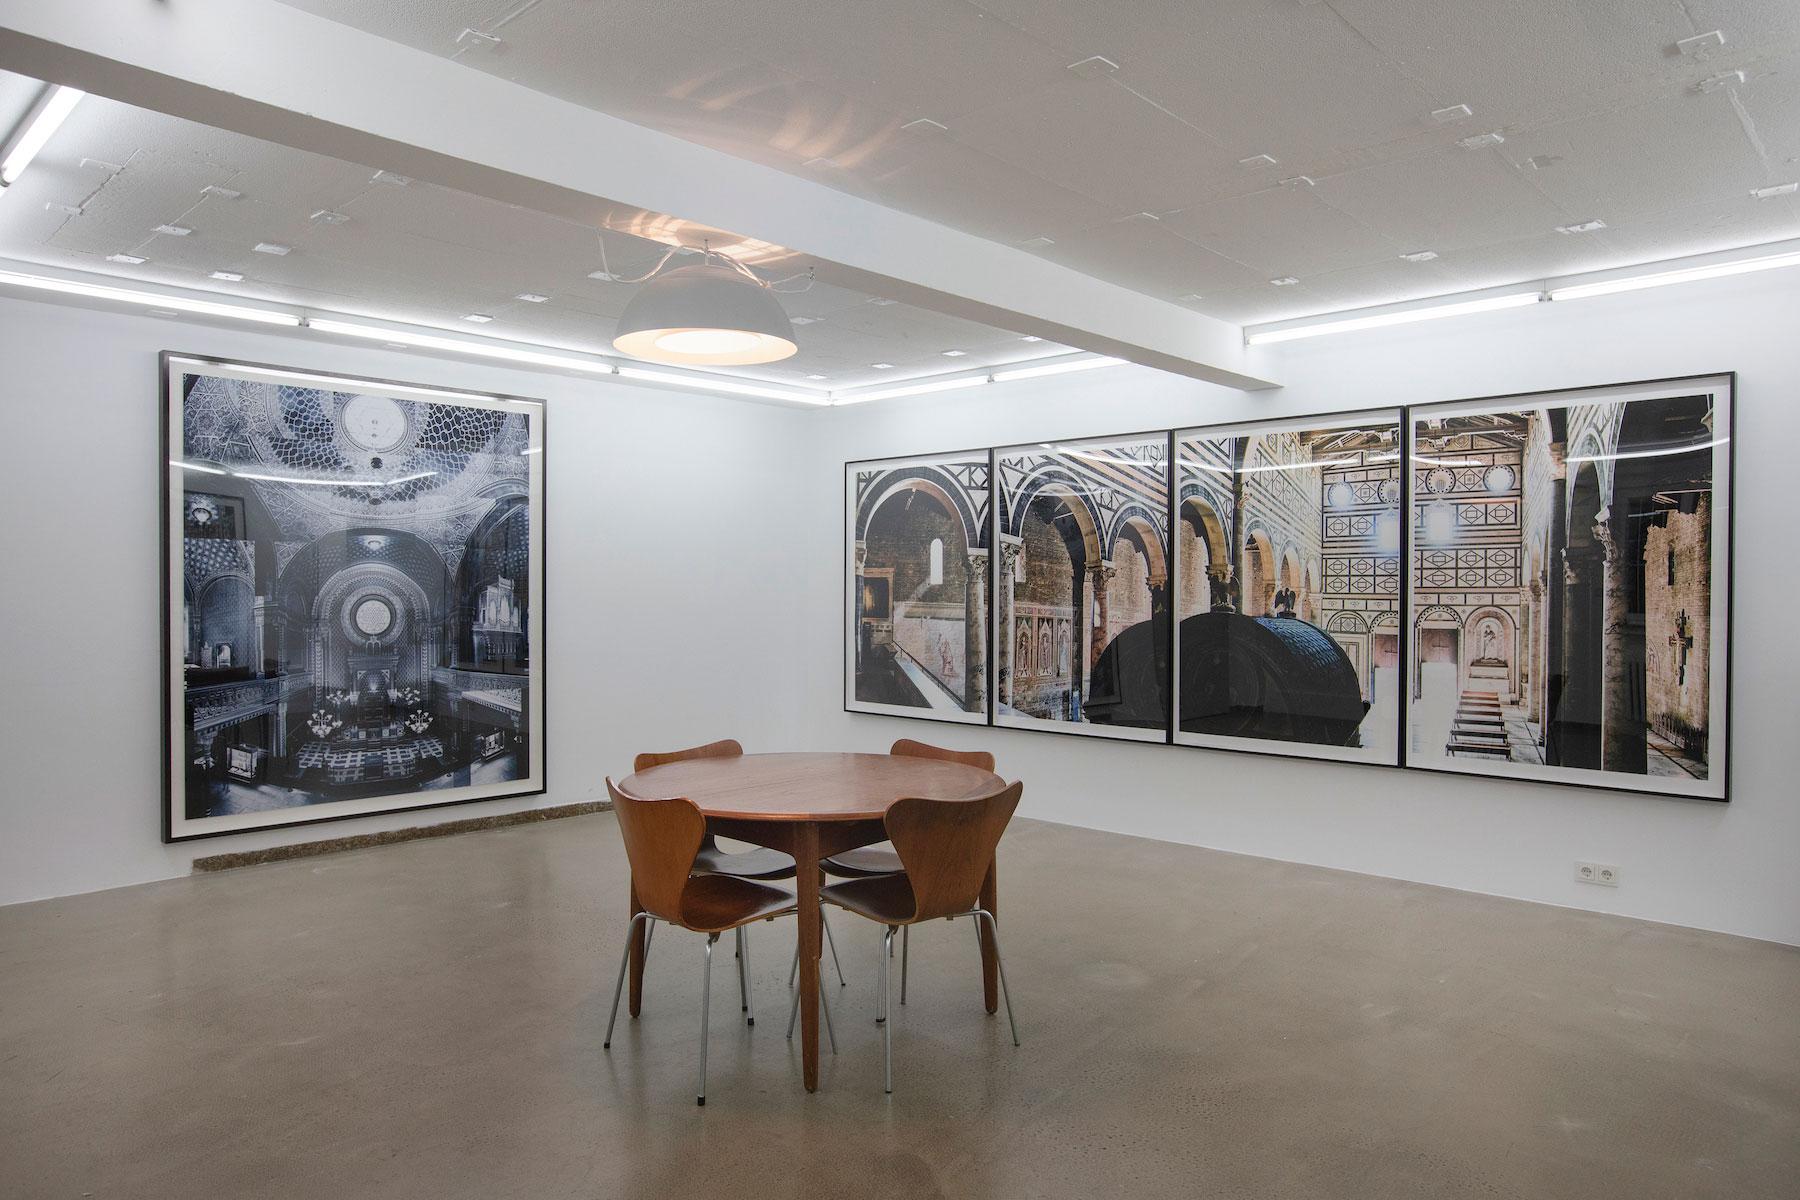 sacred-places_2019_Kolehmaien_Ola_installation-view_02